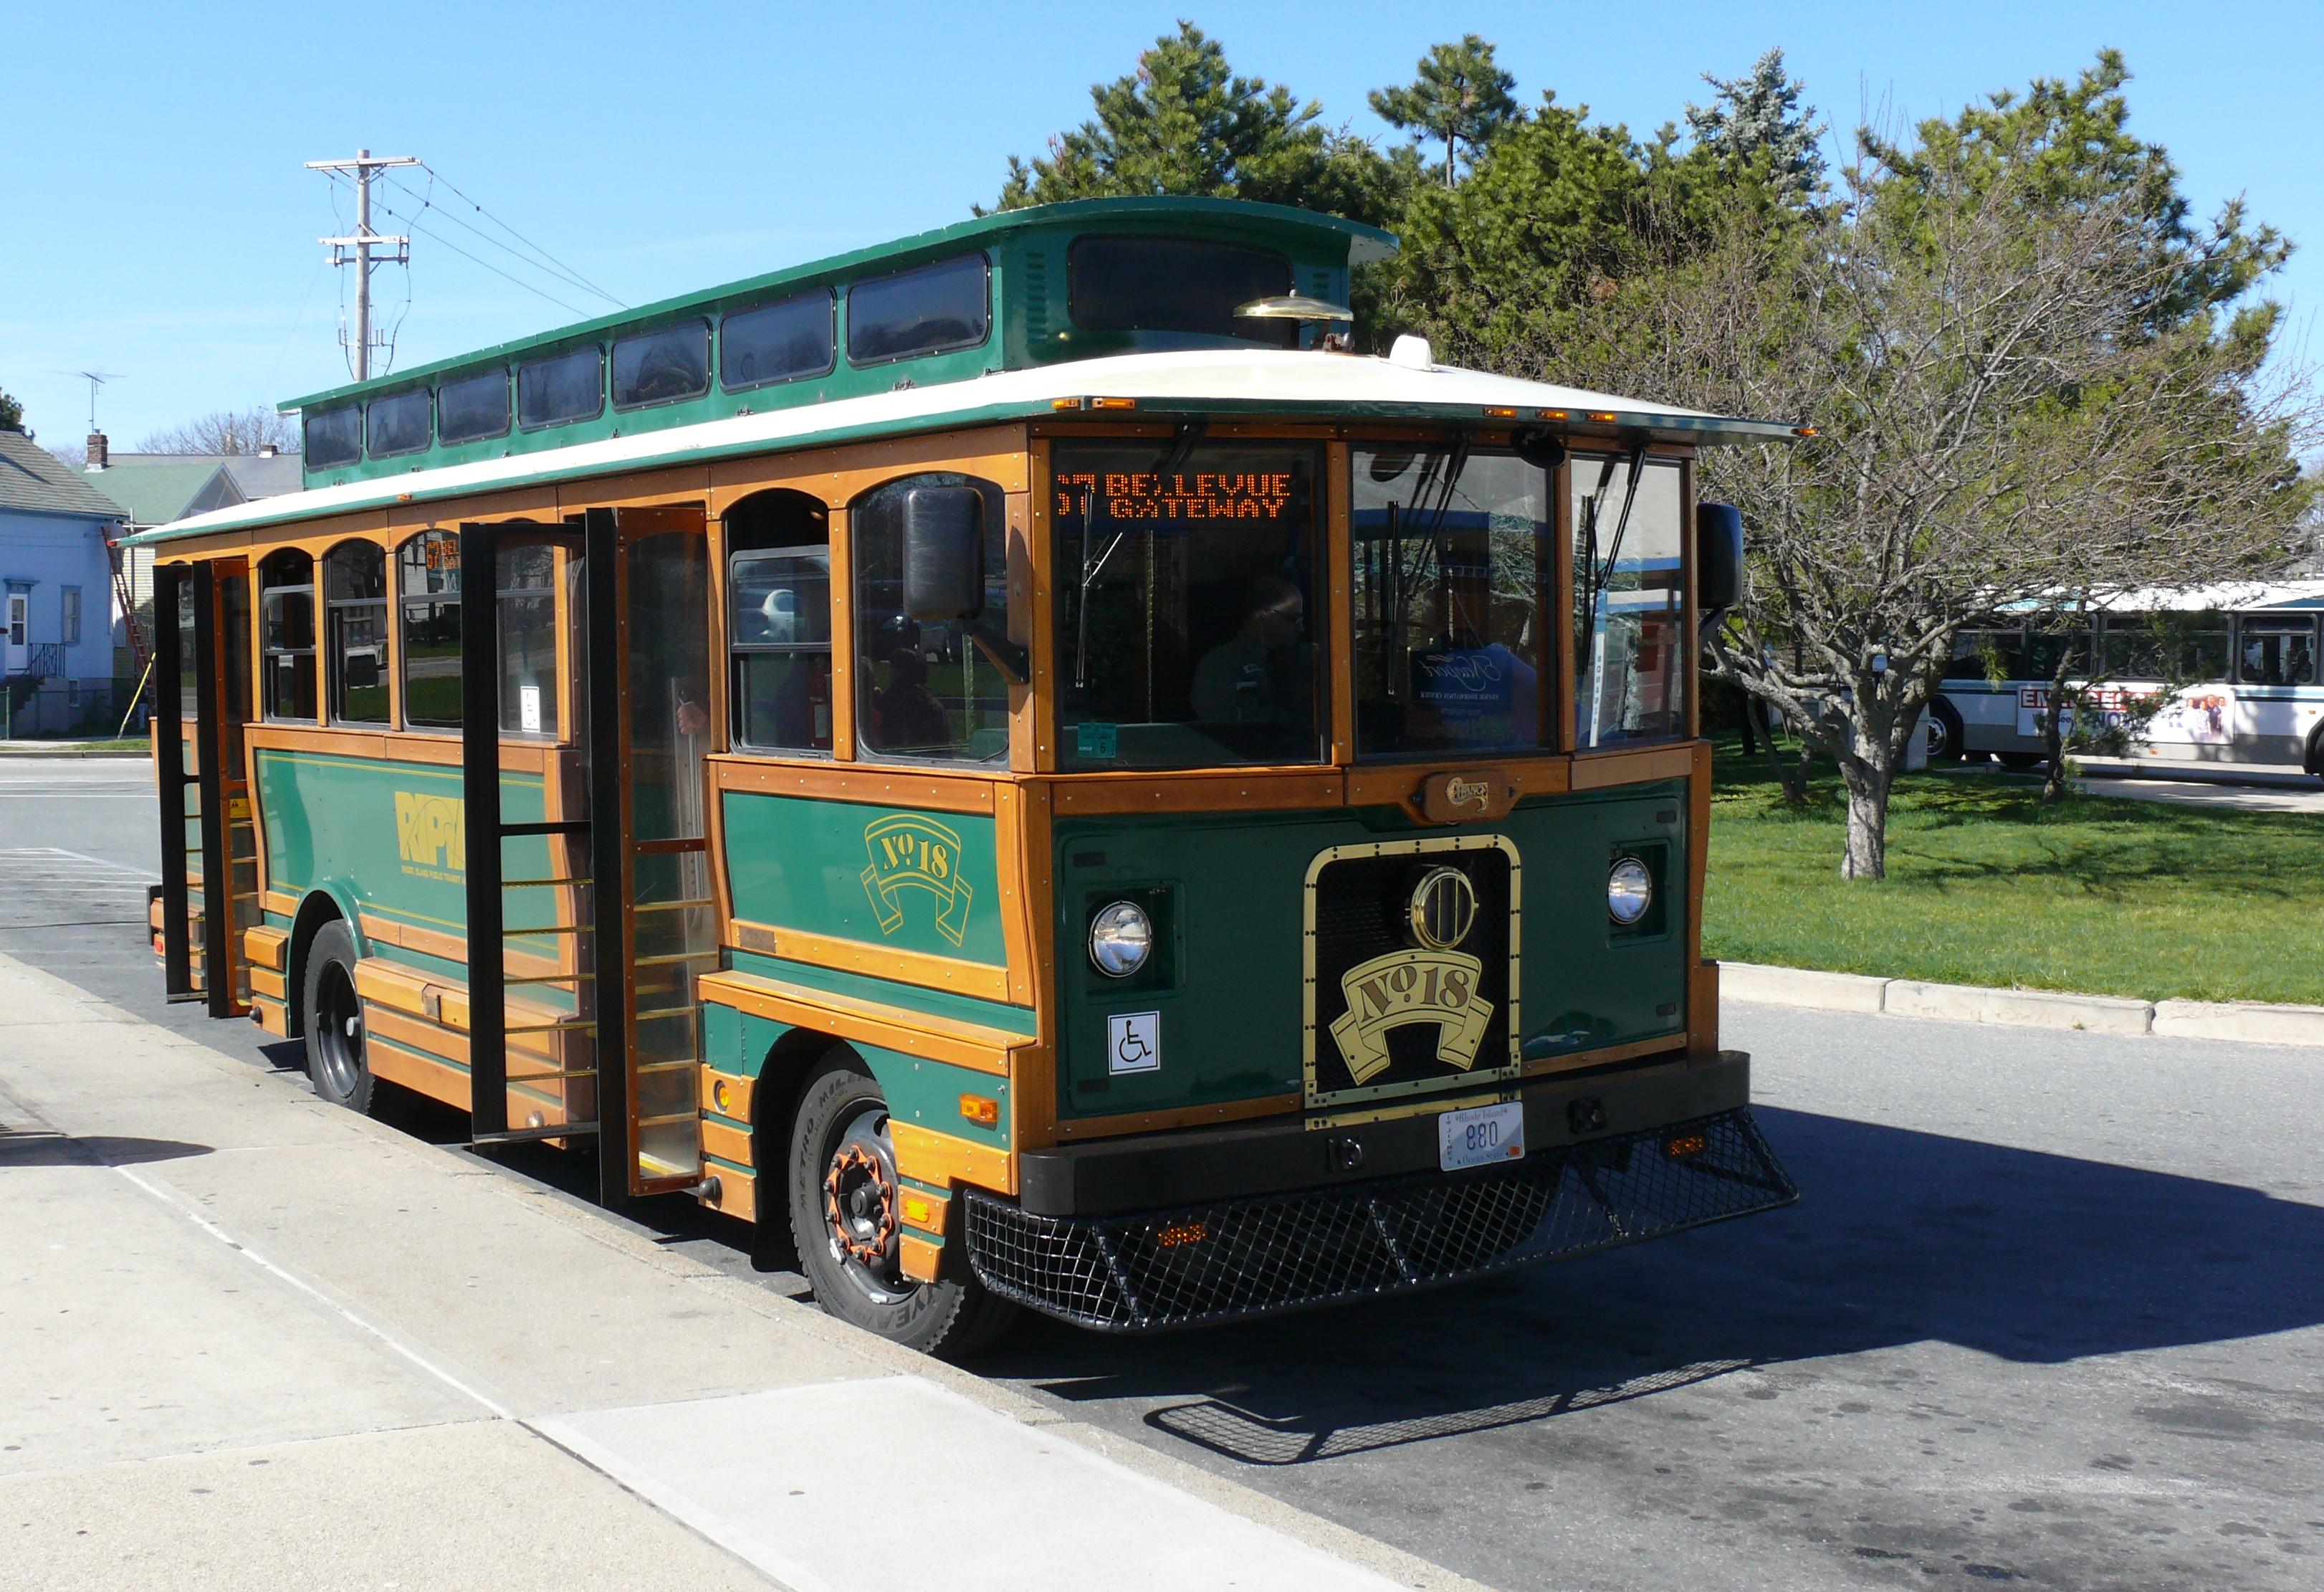 File:Newport Bus.JPG - Wikimedia Commons